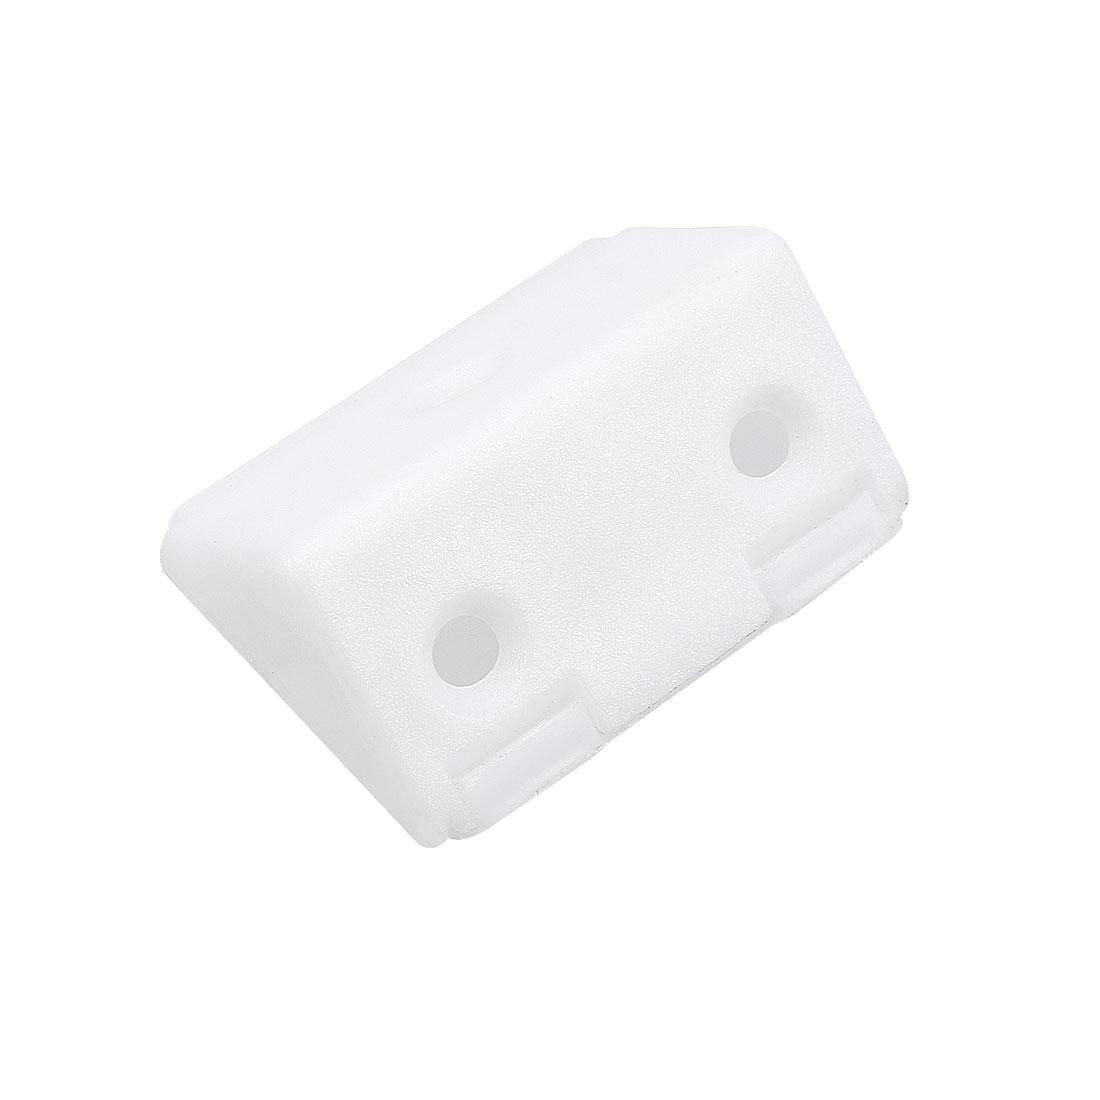 Shelf Cabinet Plastic Corner Braces 3 Holes Angle Brackets w Cover Cap, 10 Pcs